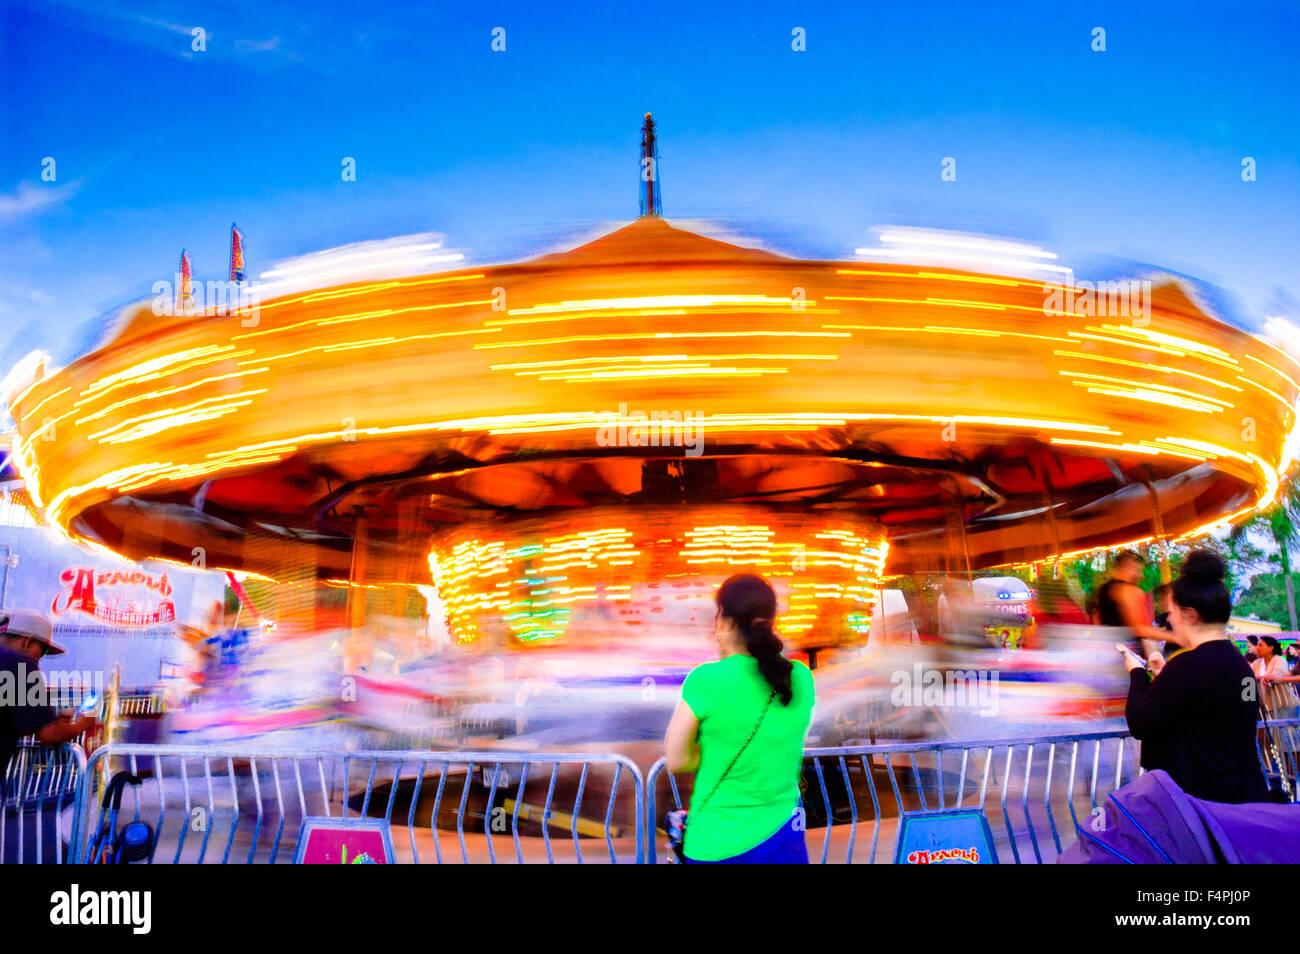 amusement amusement park amusement ride amusement rides carnival